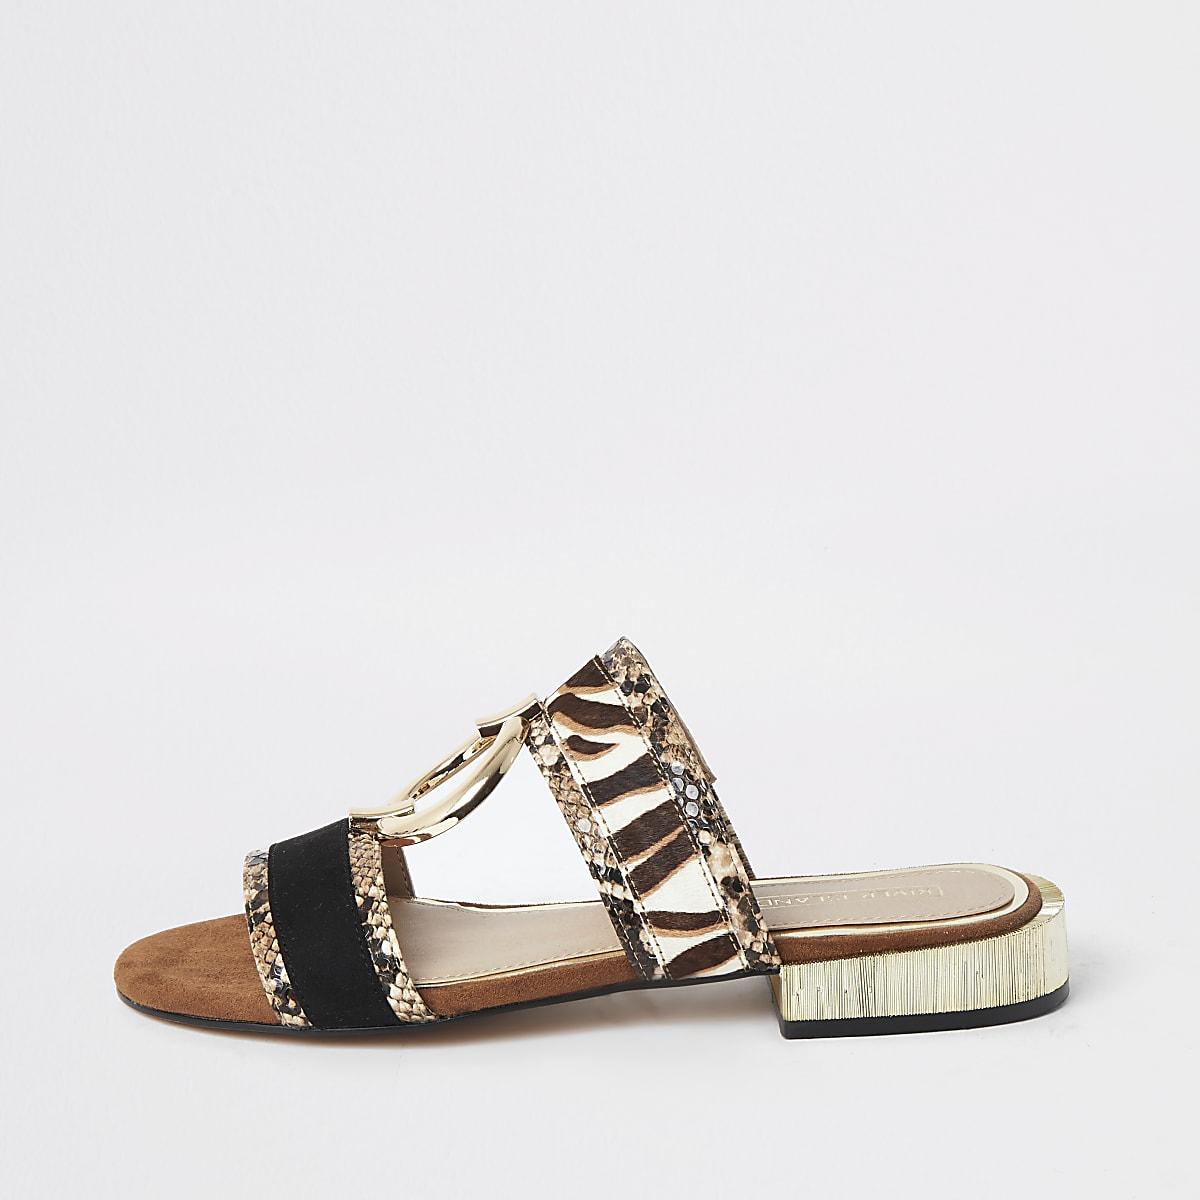 Brown snake print flat sandals